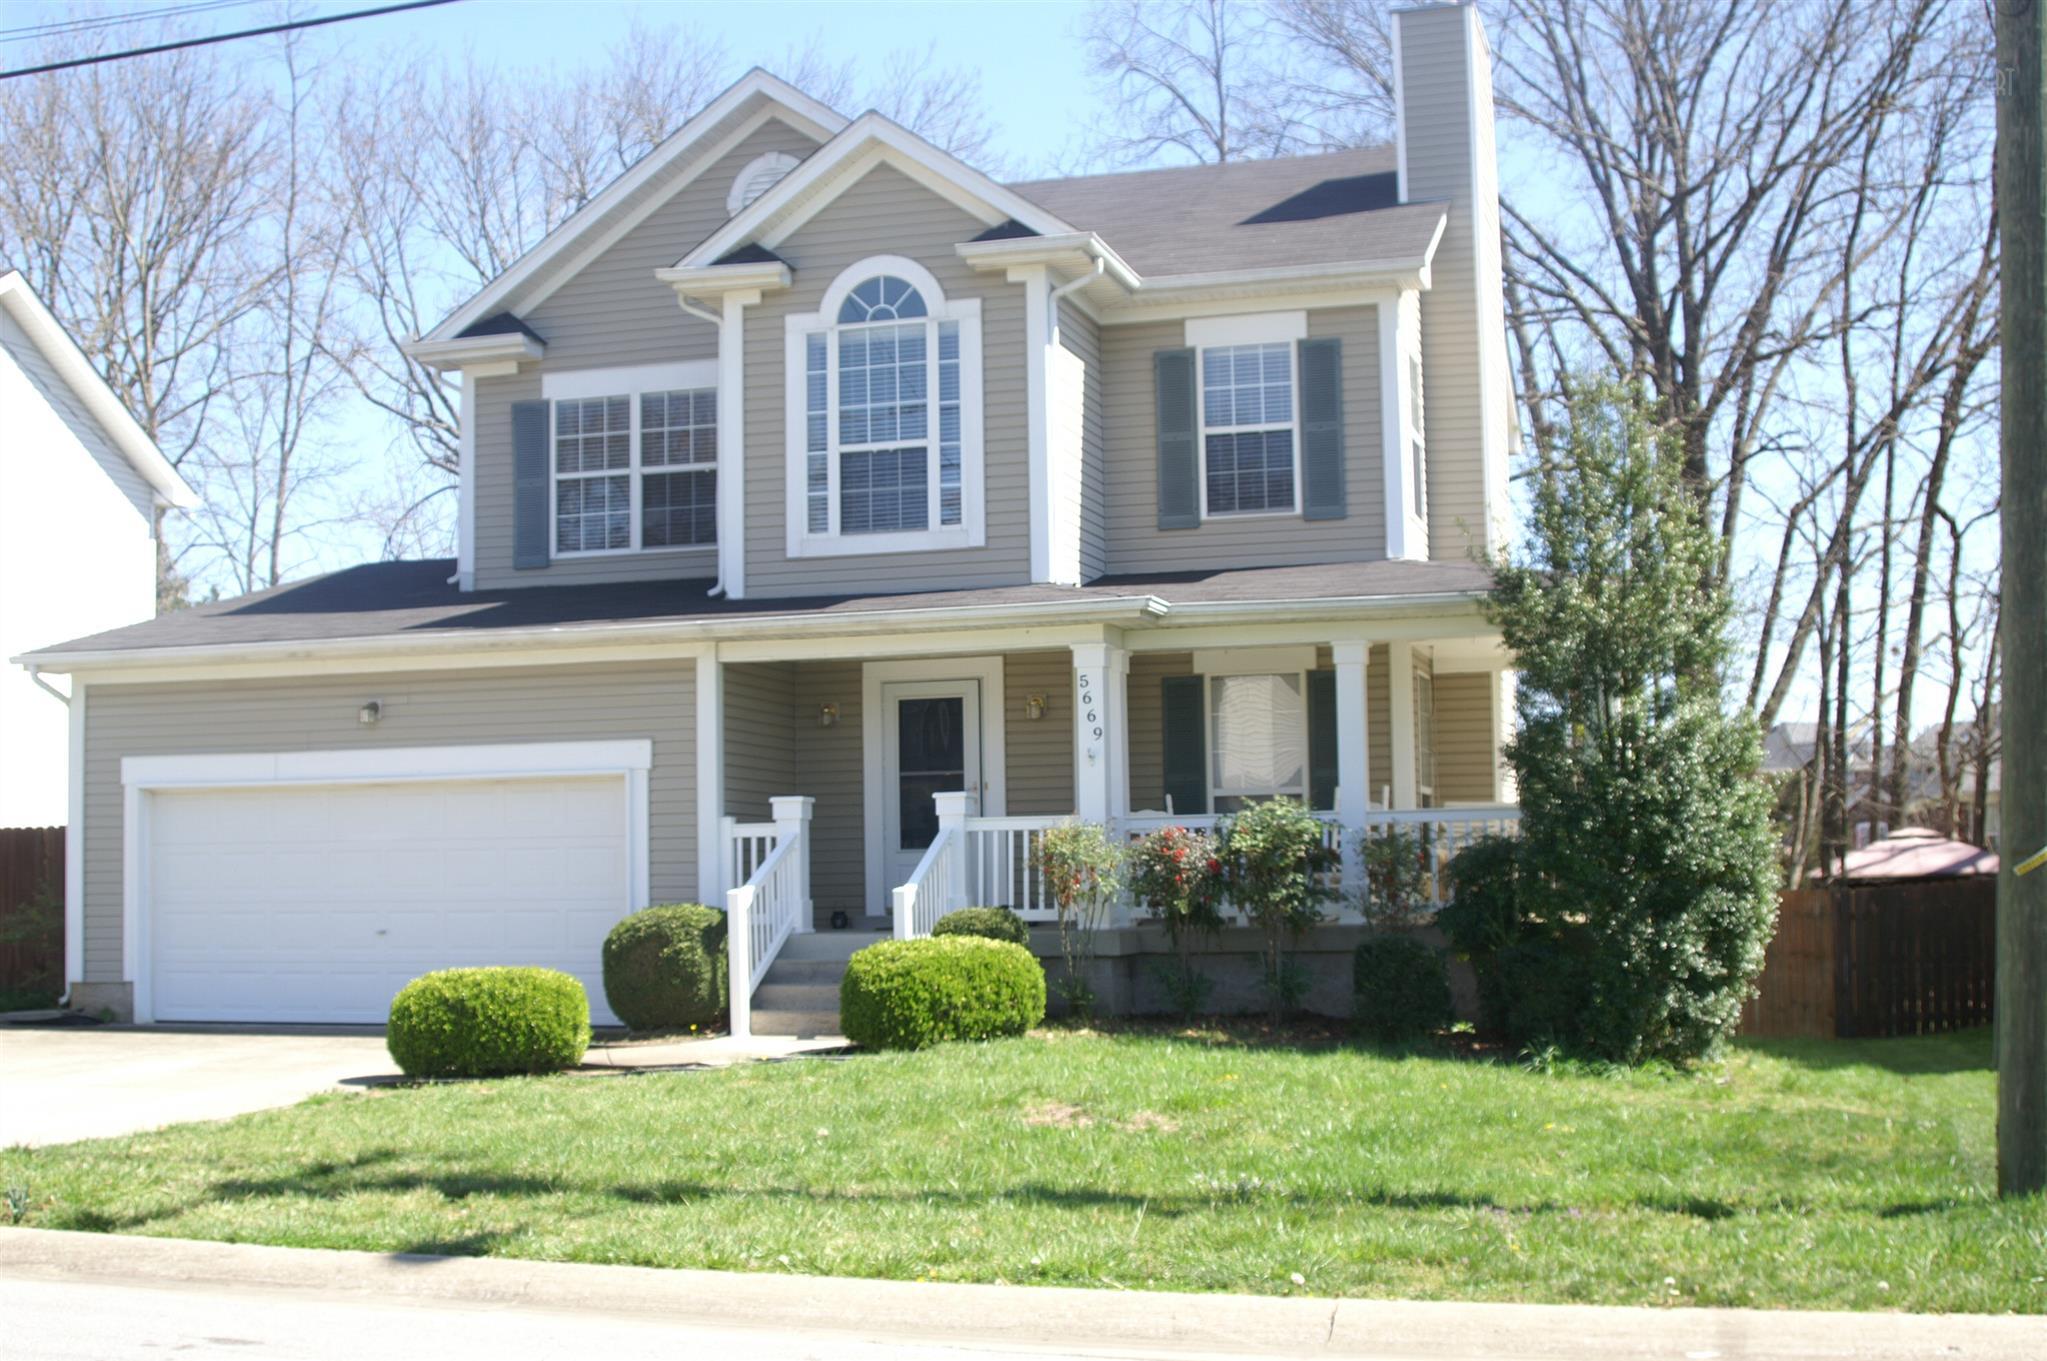 5669 Chestnutwood Trl, Hermitage, TN